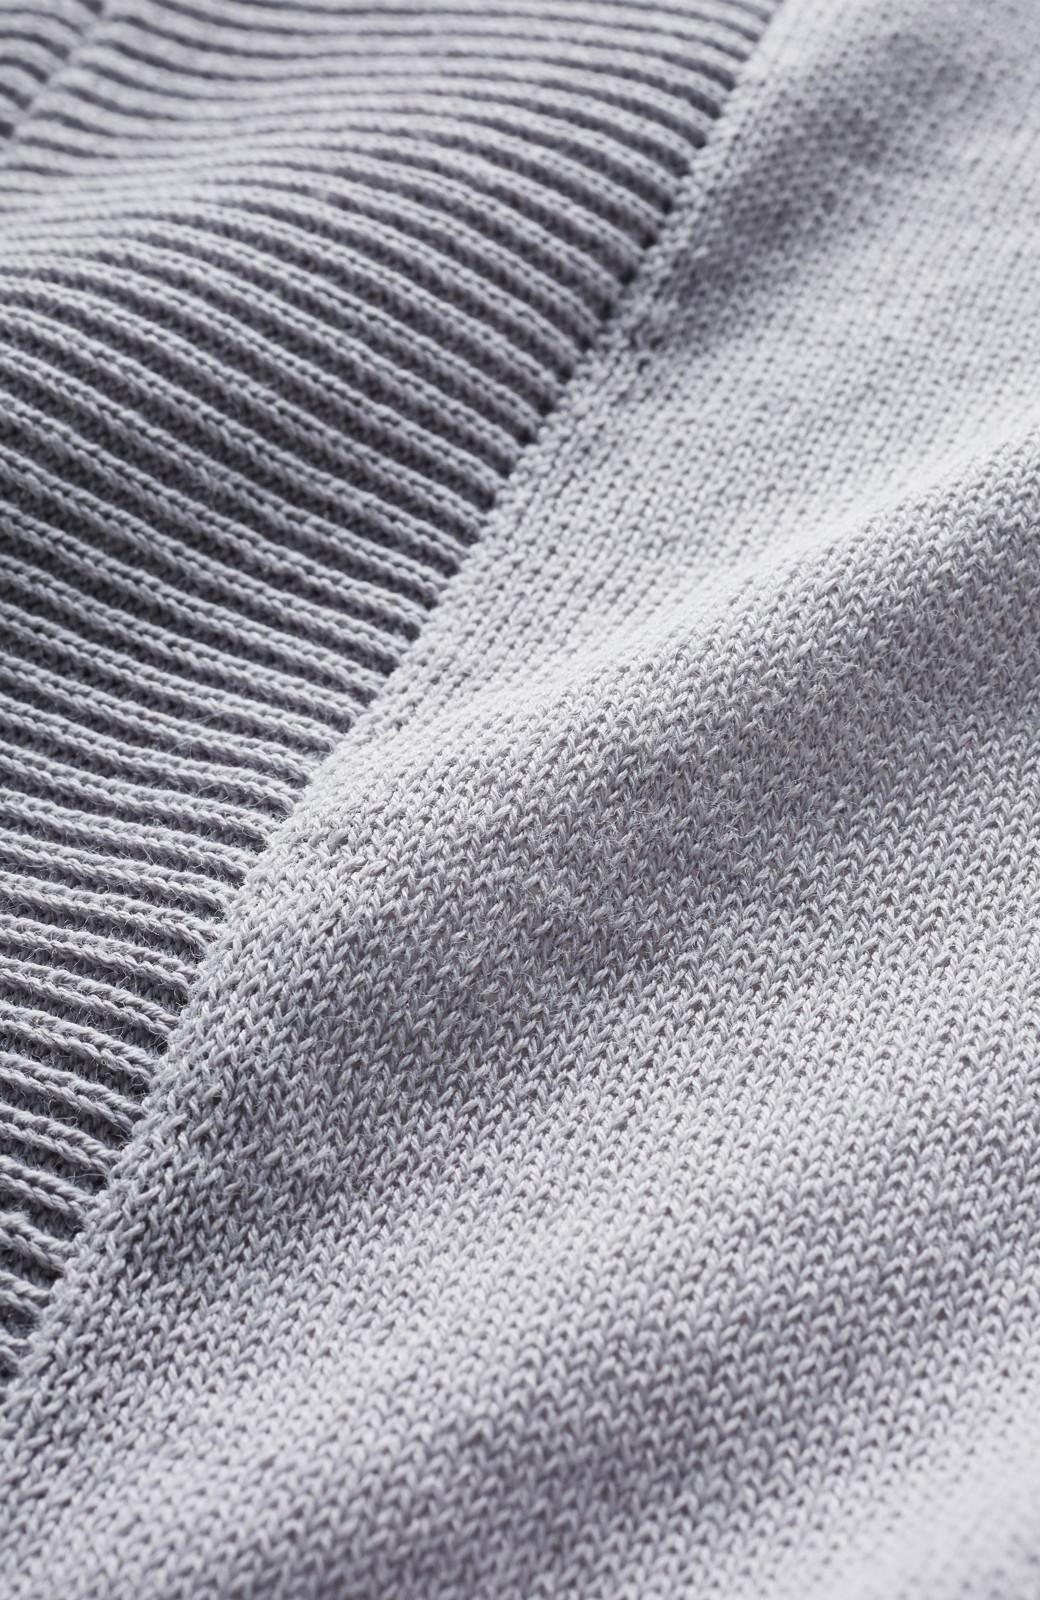 haco! カットソー感覚で着られる 洗えるオトナニットトップス by MAKORI <ライトグレー>の商品写真4